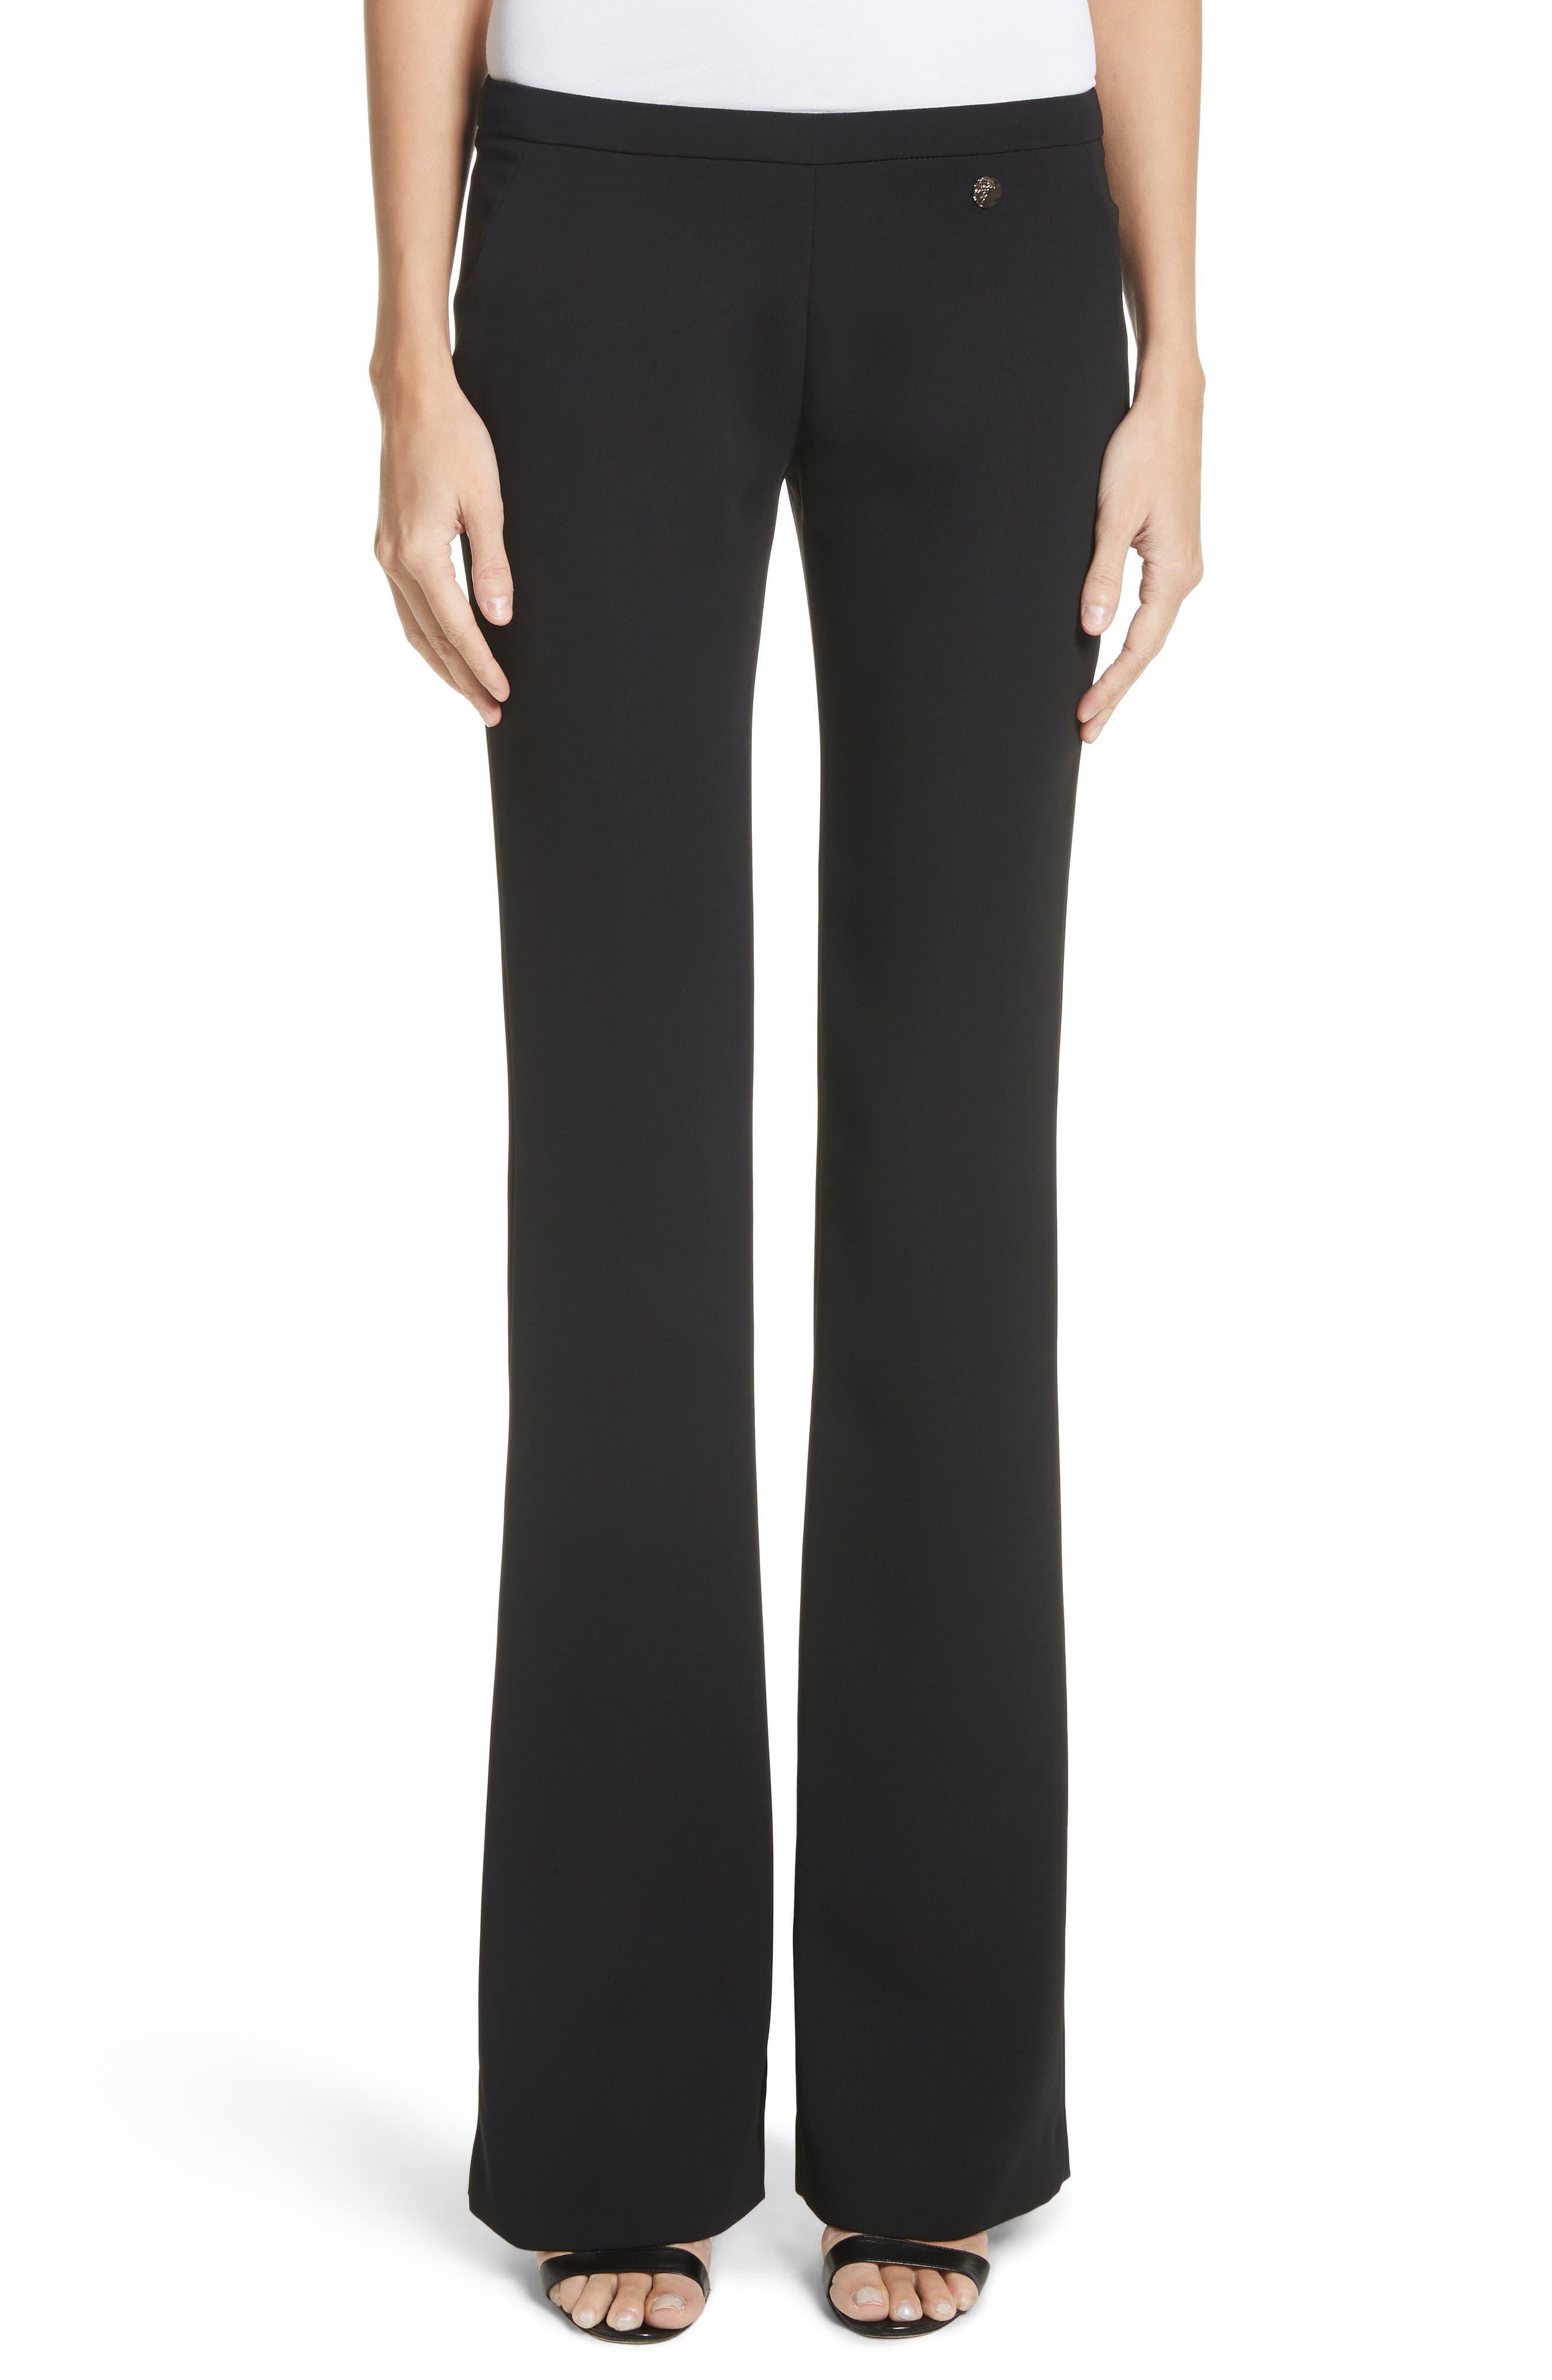 Cady Flare Pants,                         Main,                         color, Black